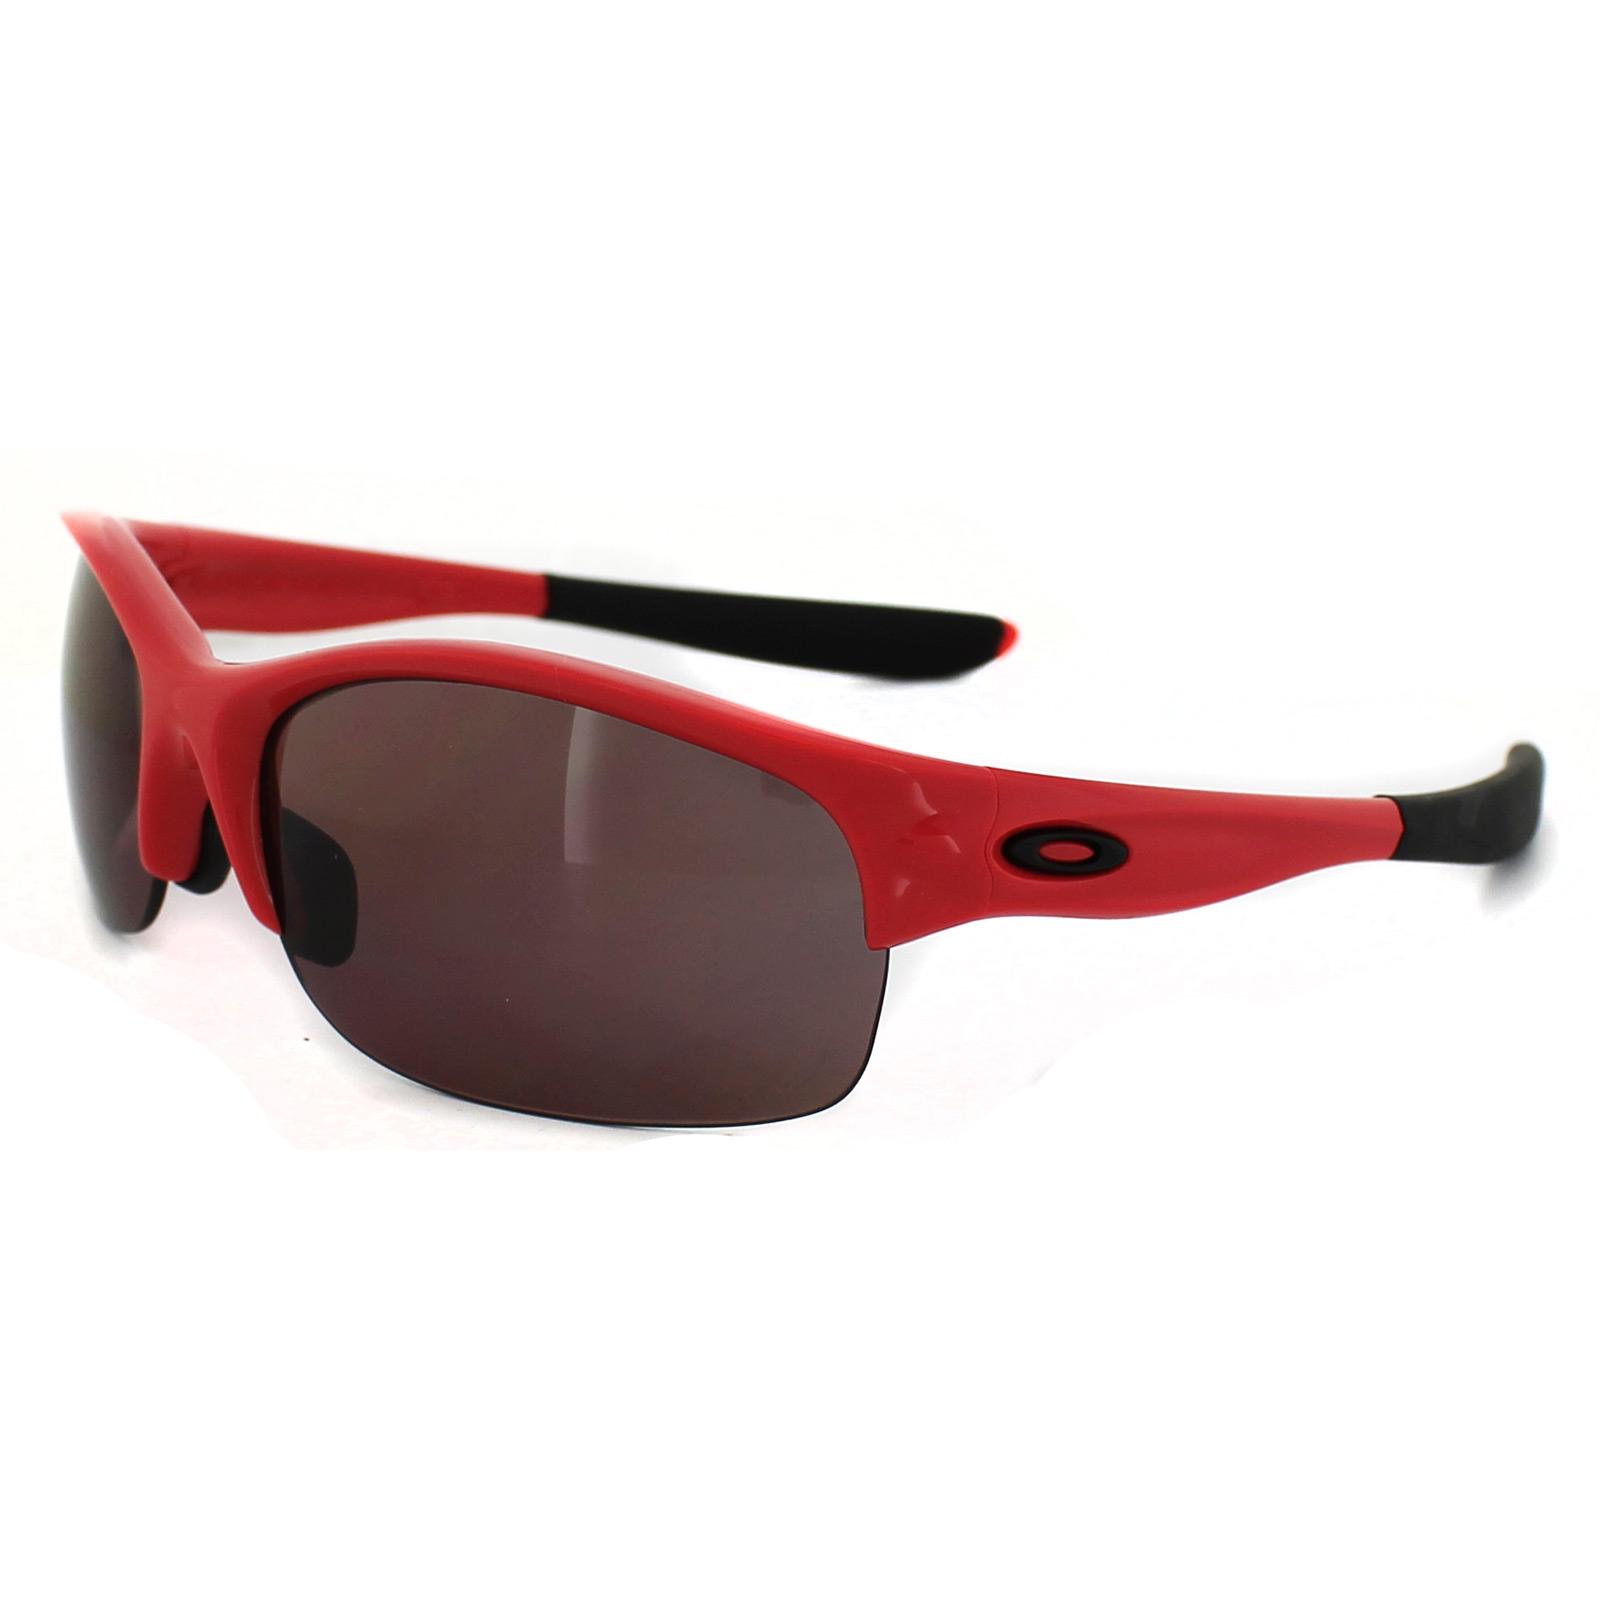 pink oakley commit sunglasses  oakley commit sq sunglasses